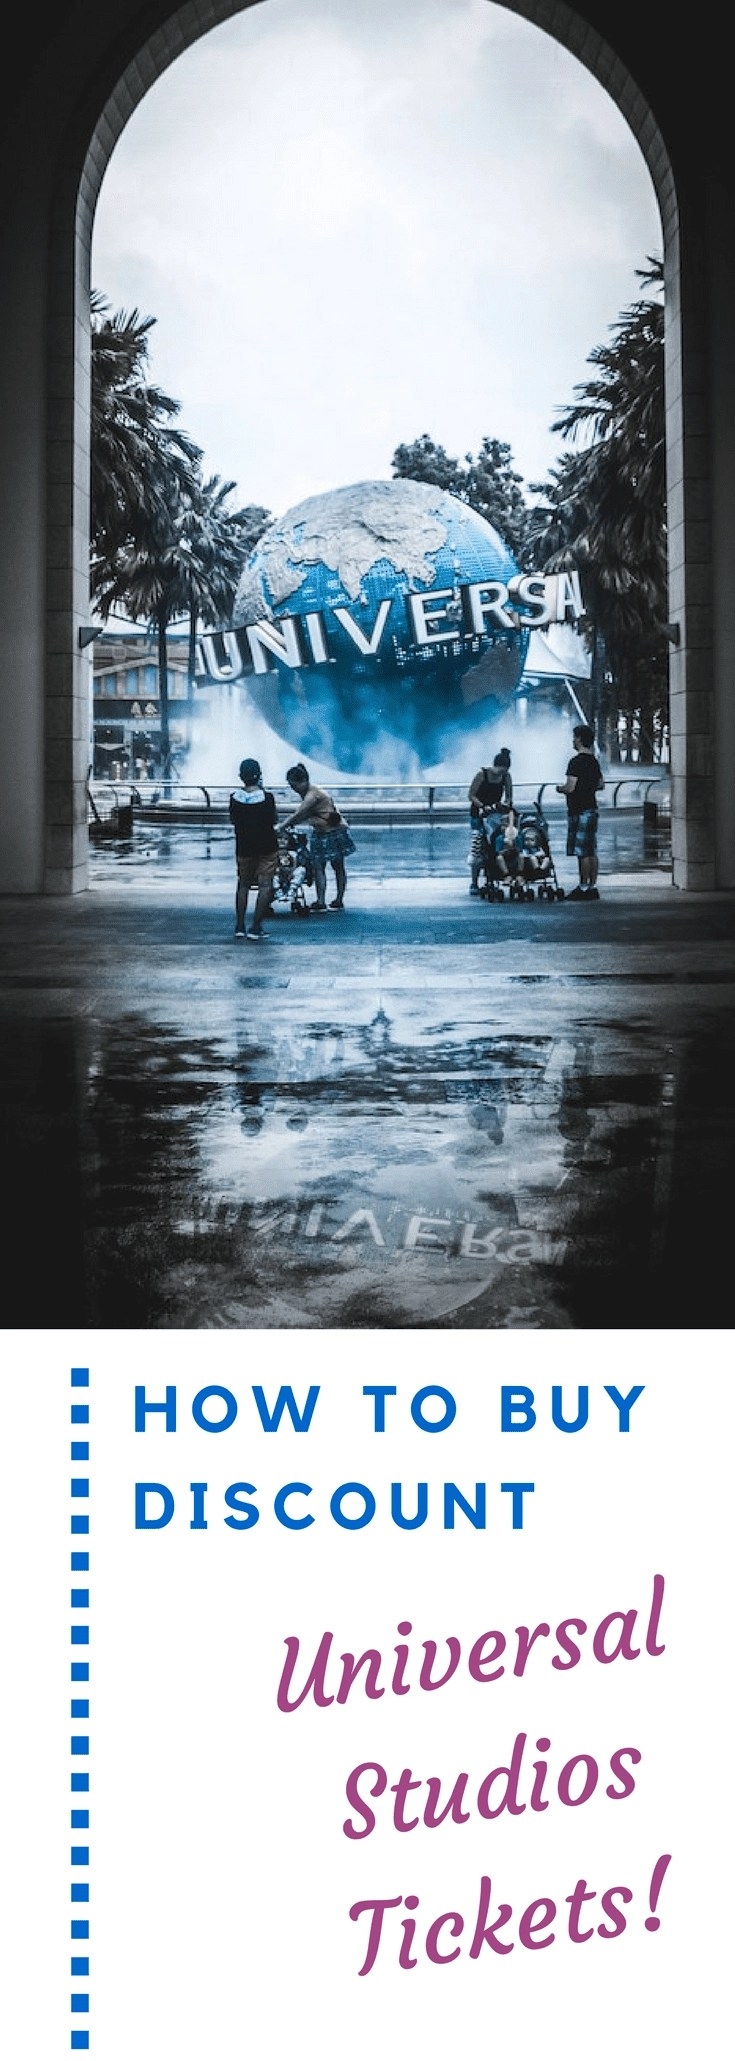 How to buy Universal Studios Discount Tickets